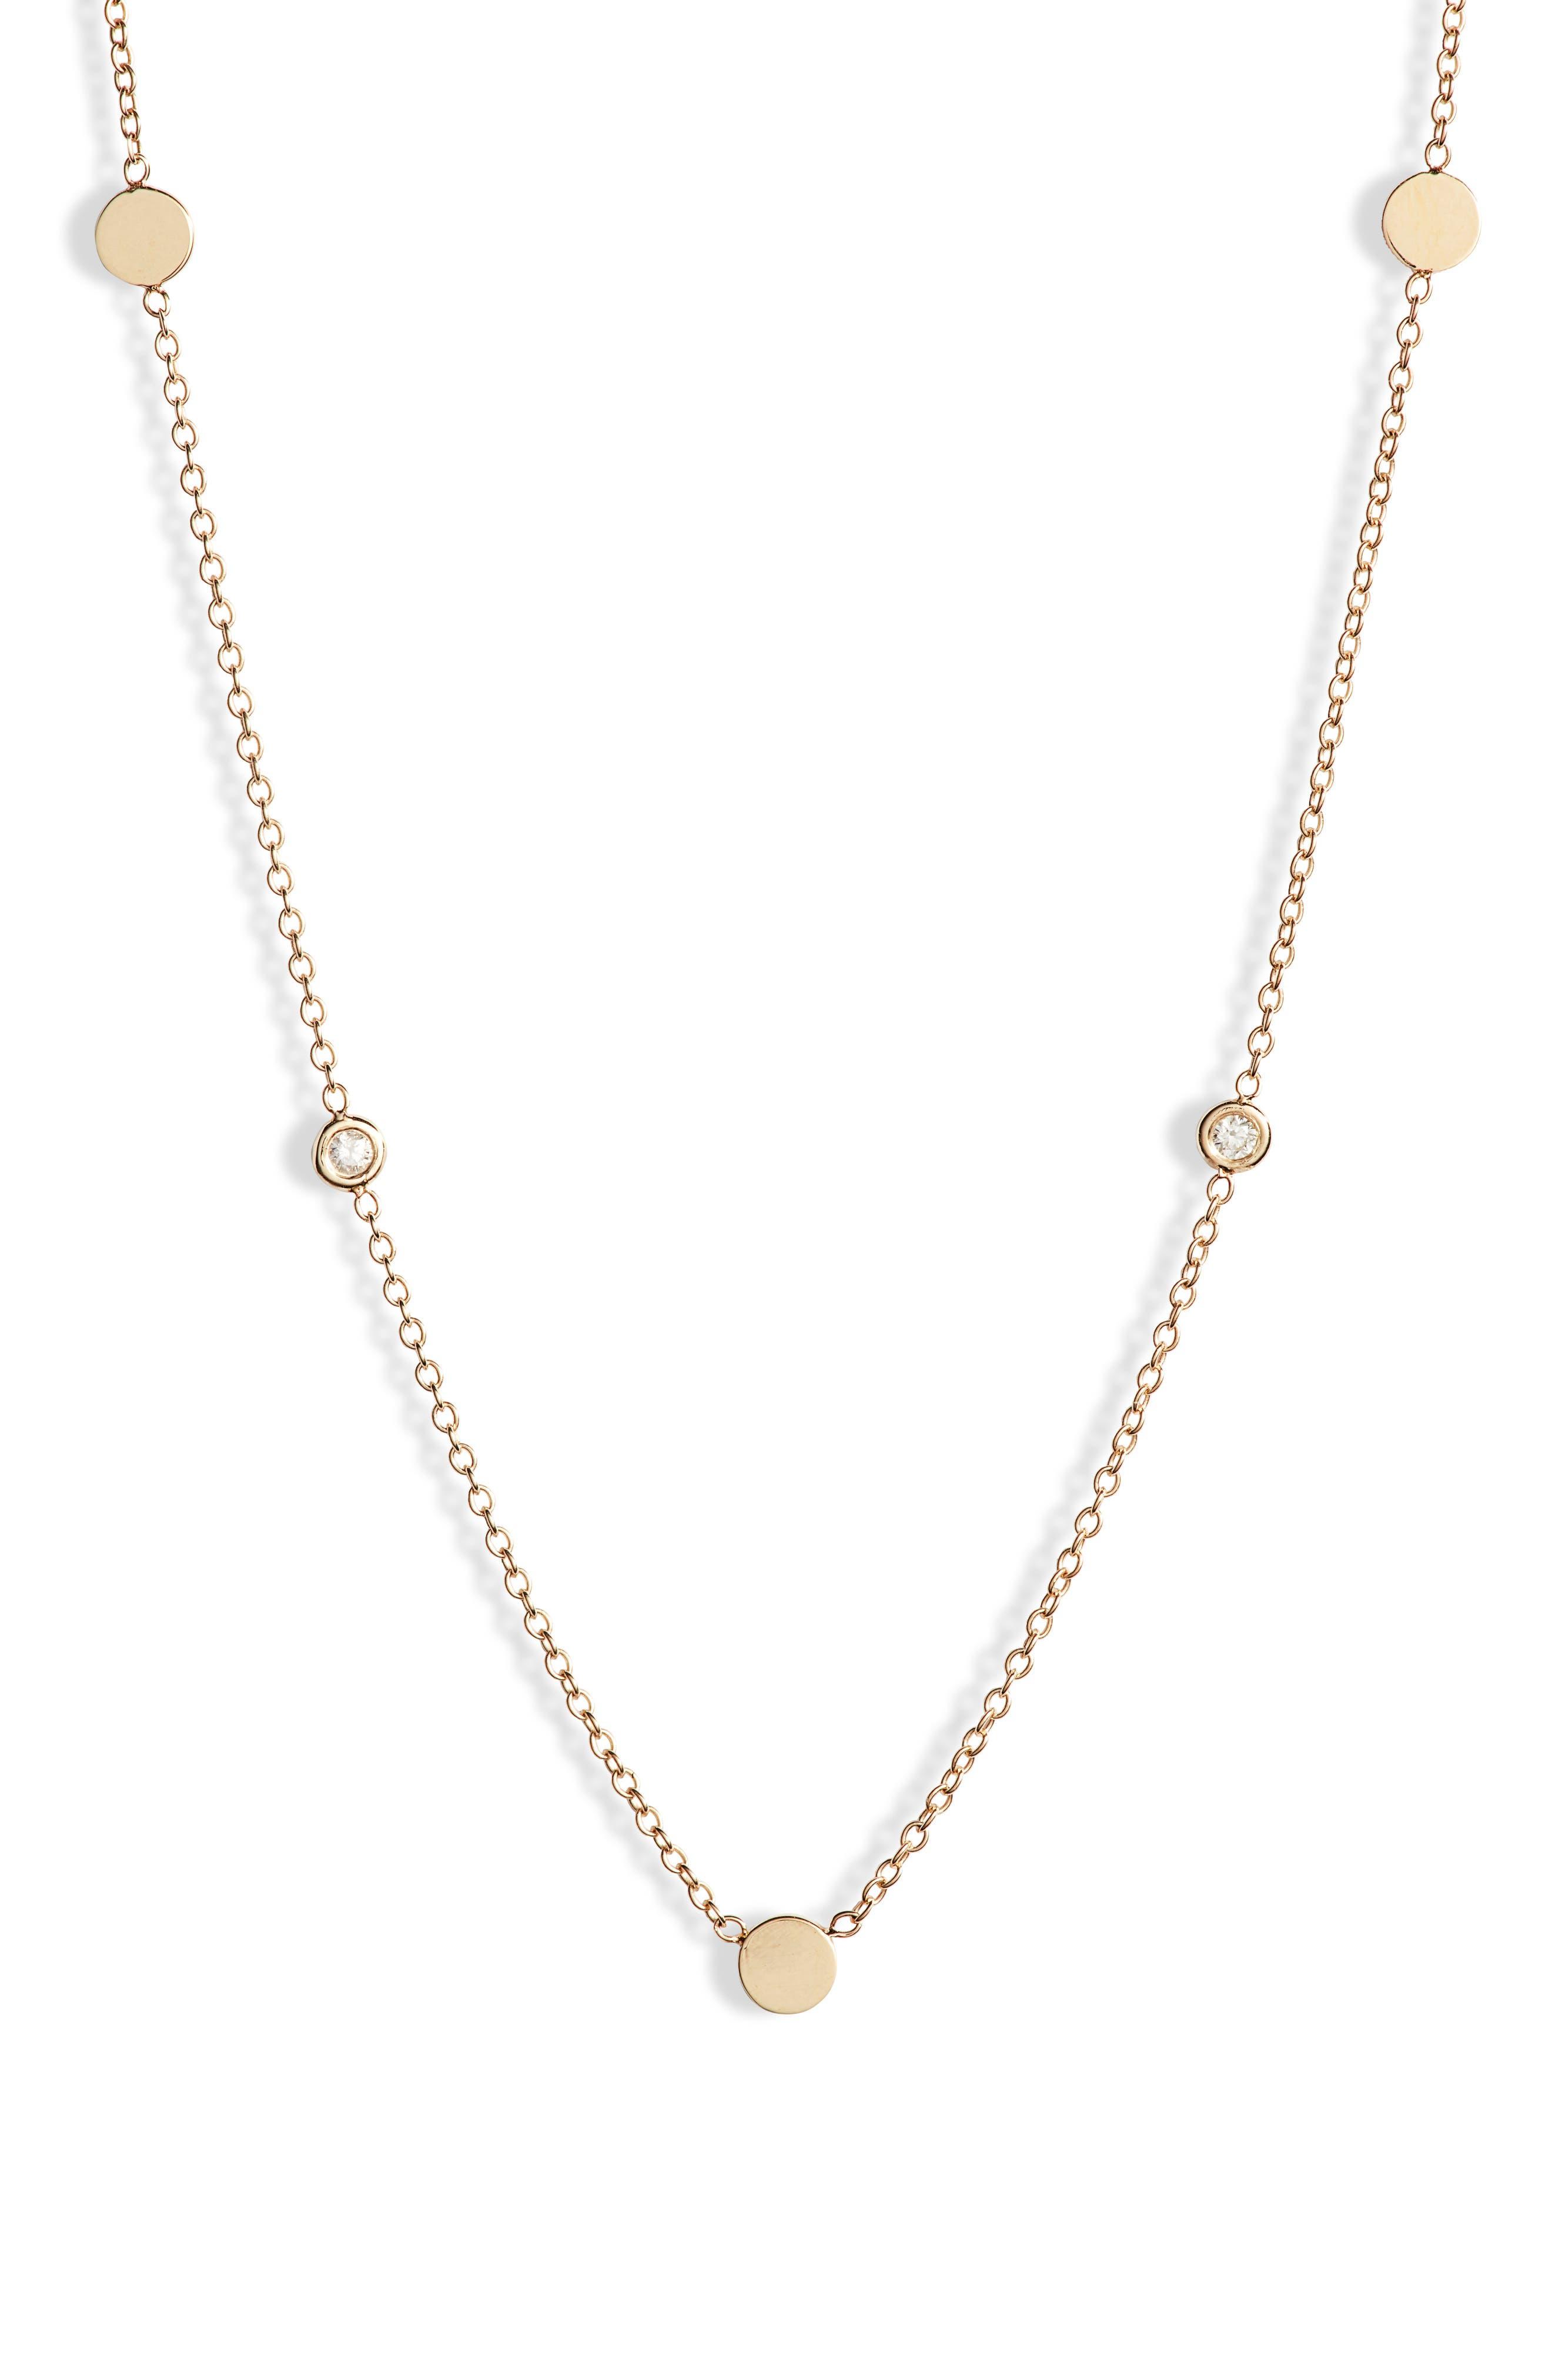 Zoe Chicco Bezel Diamond Necklace